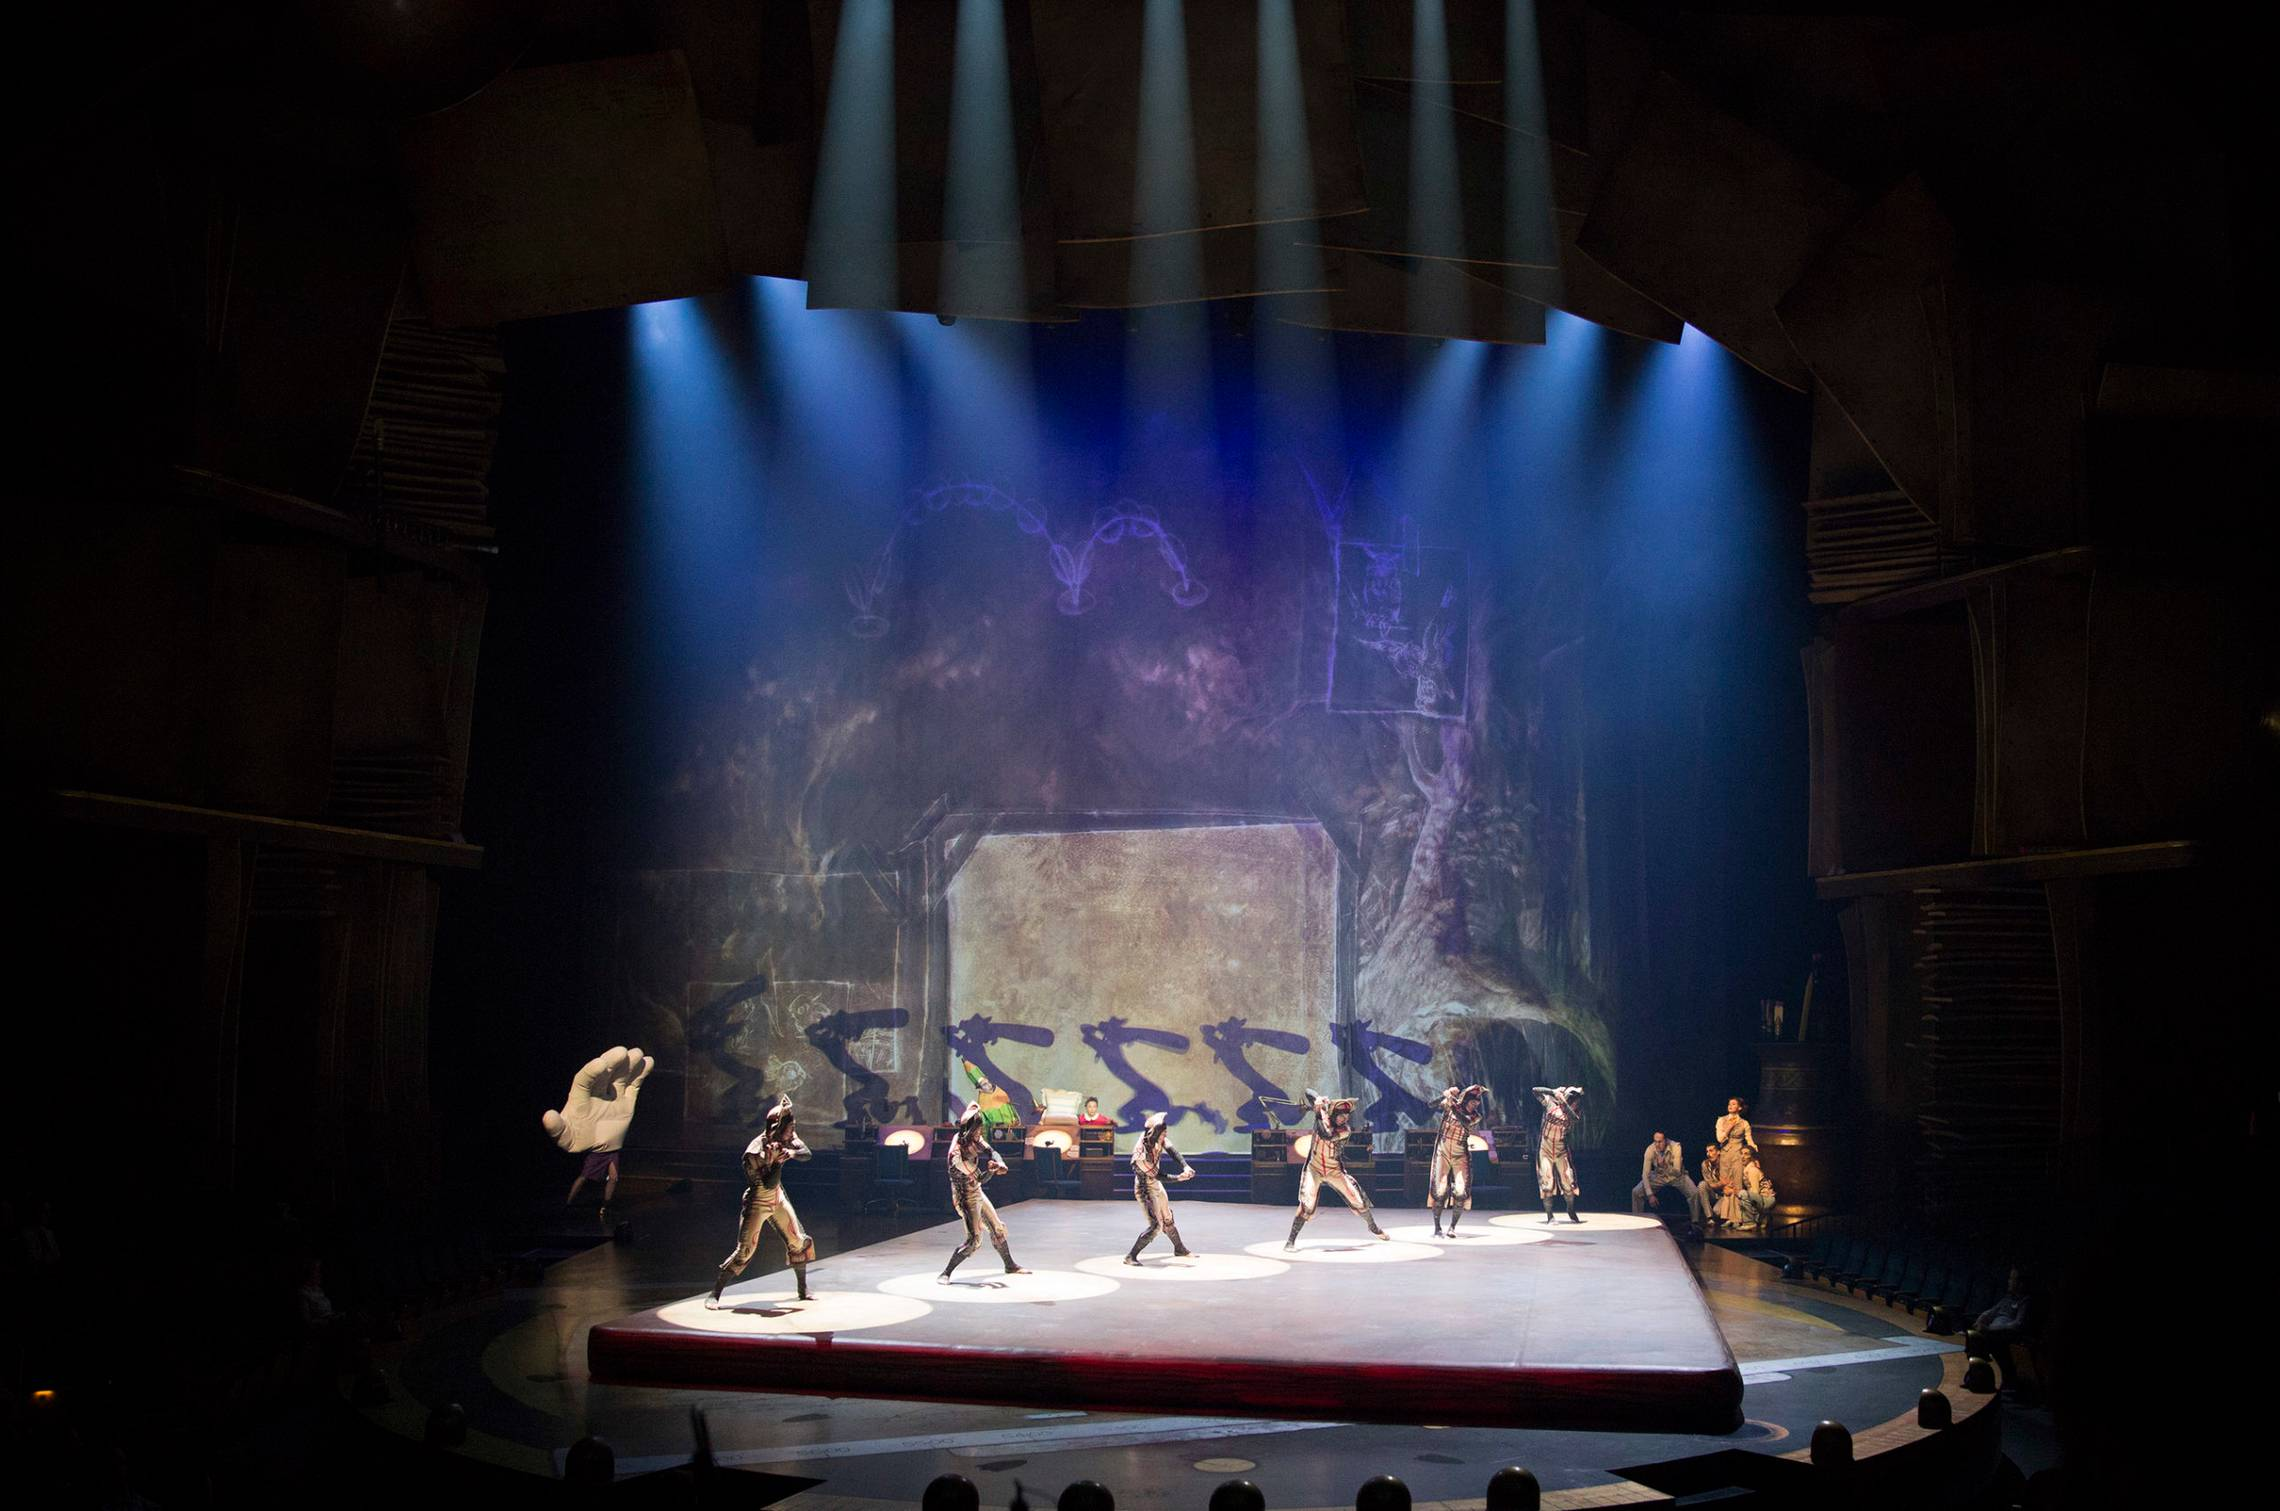 New 'Drawn to Life' Cirque du Soleil show at Walt Disney World